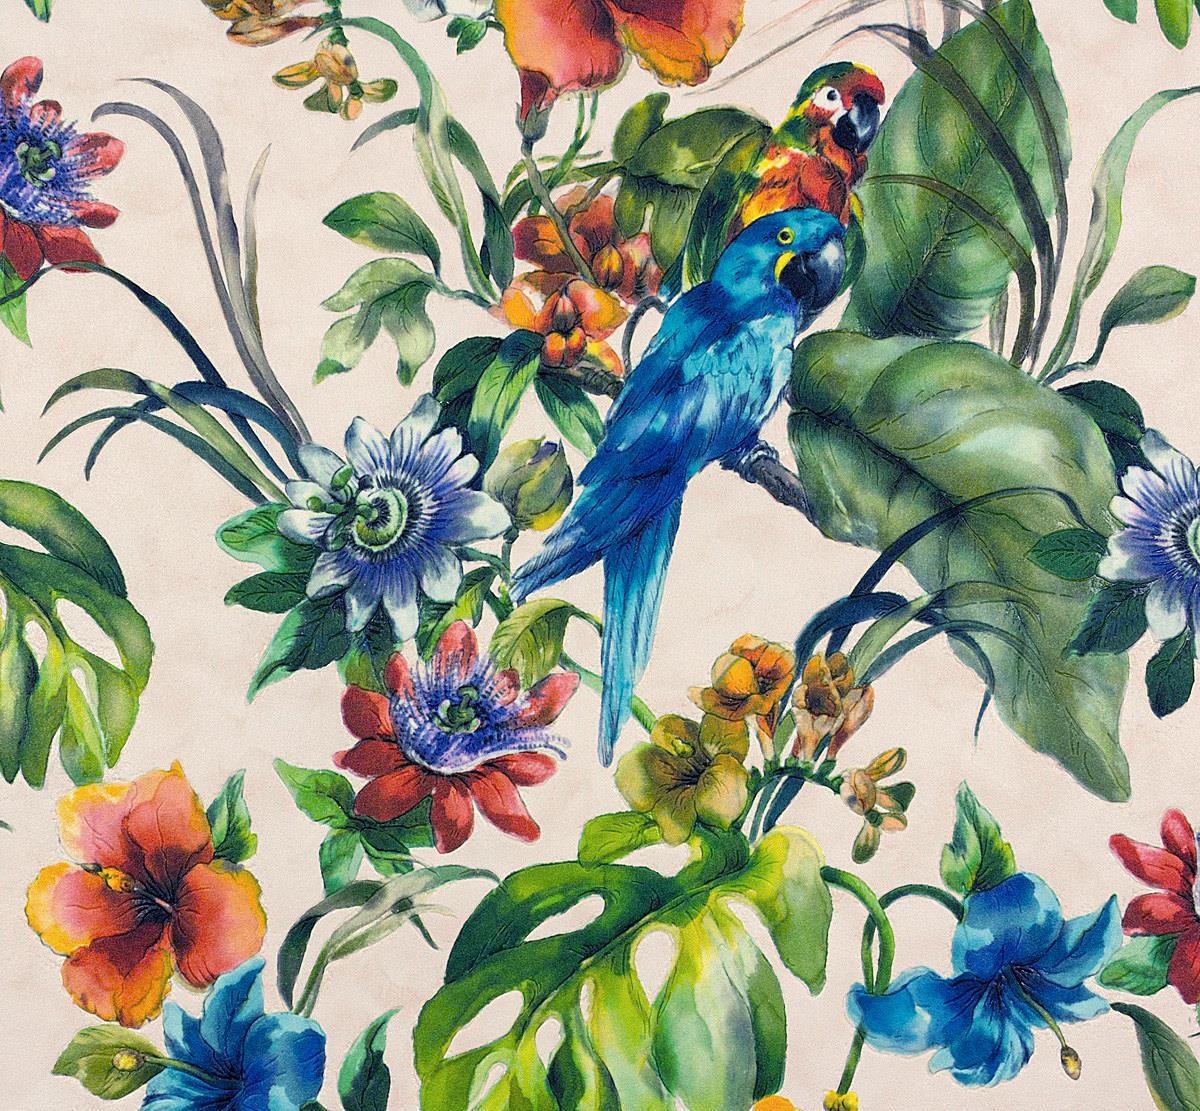 Exotic Bird Parrot Tropical Flowers Wallpaper Vinyl Floral Green